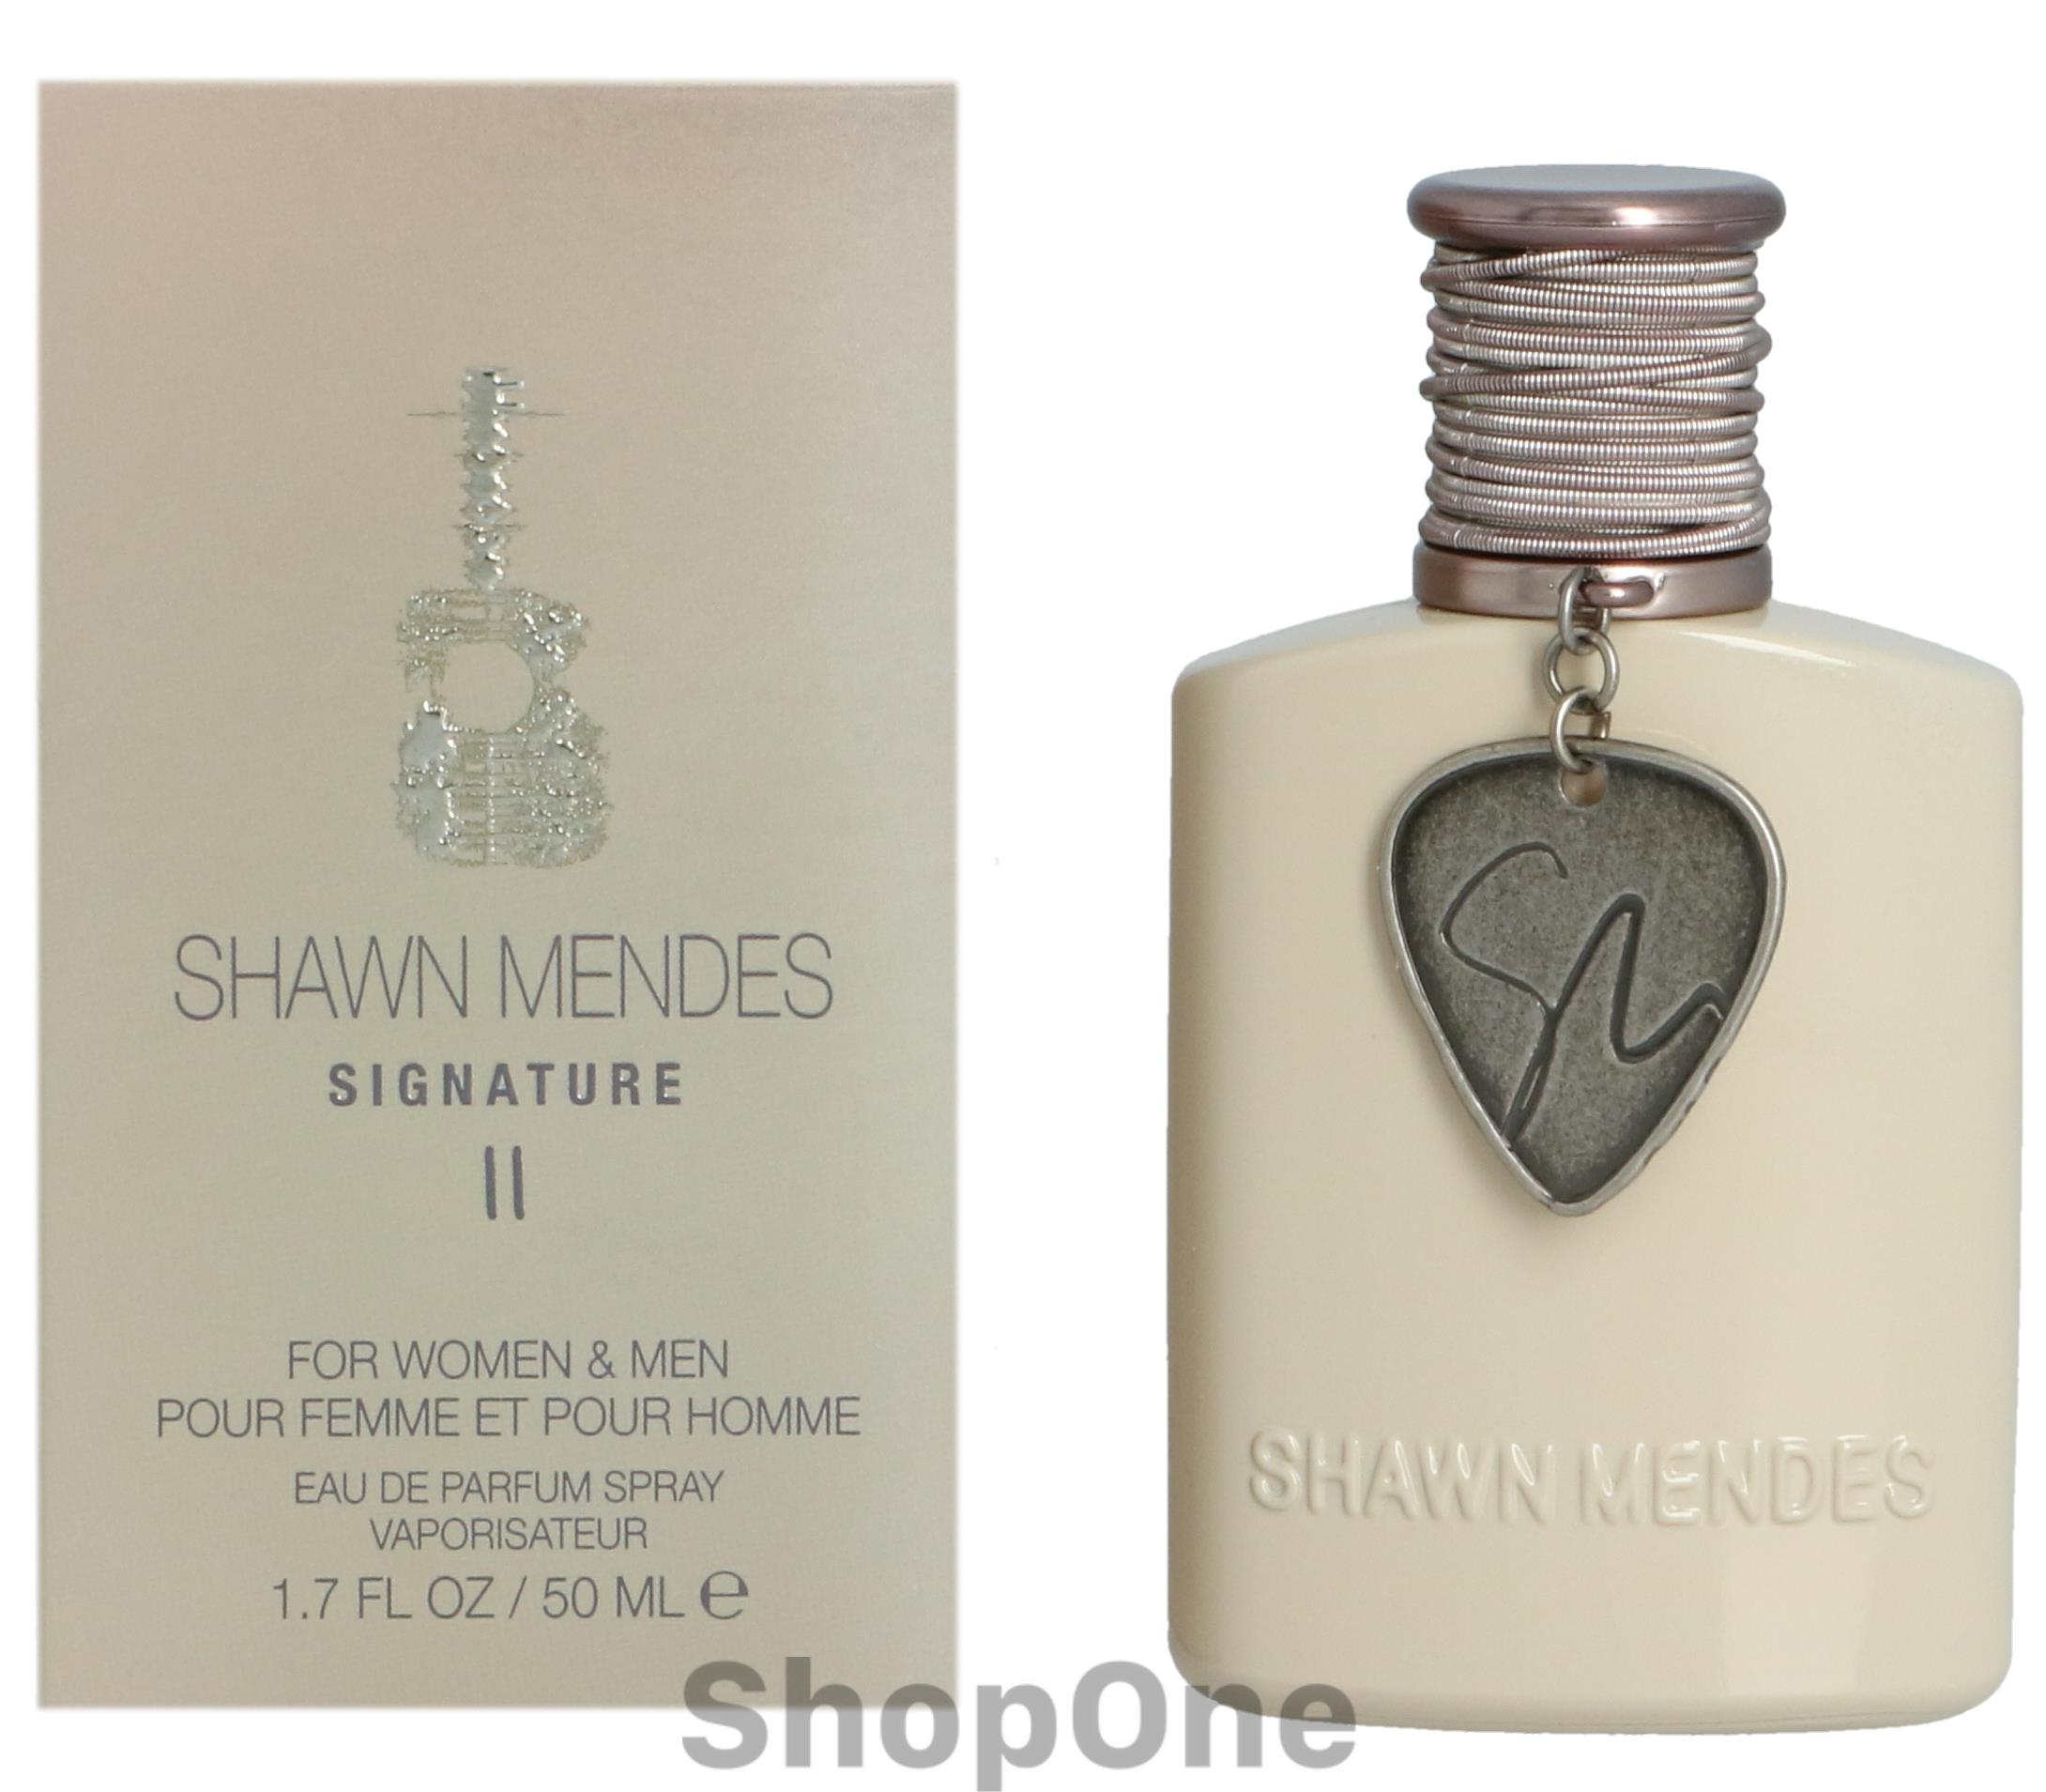 Signature II Edp Spray 50 ml fra Shawn Mendes - Unisexgeuren Shawn Mendes Signature II Edp Spray 50 ml. Fra Shawn Mendes.